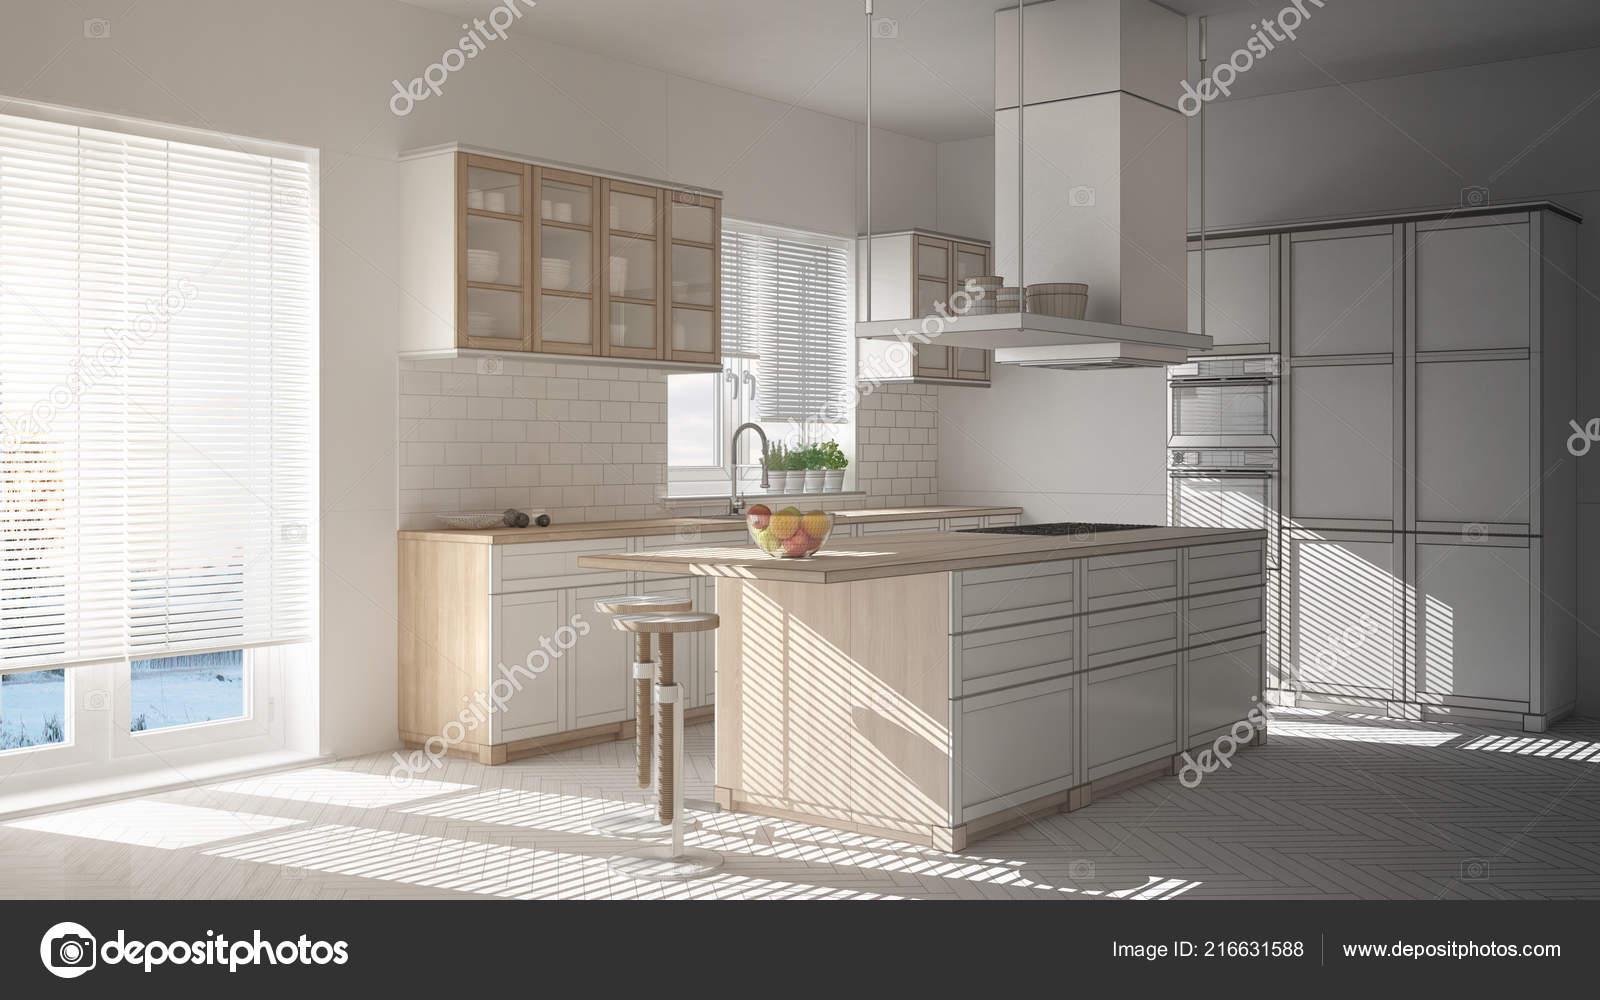 islands for the kitchen coffee station 未完成的项目的现代木白色厨房与岛屿凳子和窗户镶木人字地板 图库照片 未完成的项目的现代木白色厨房与岛屿凳子和窗户镶木